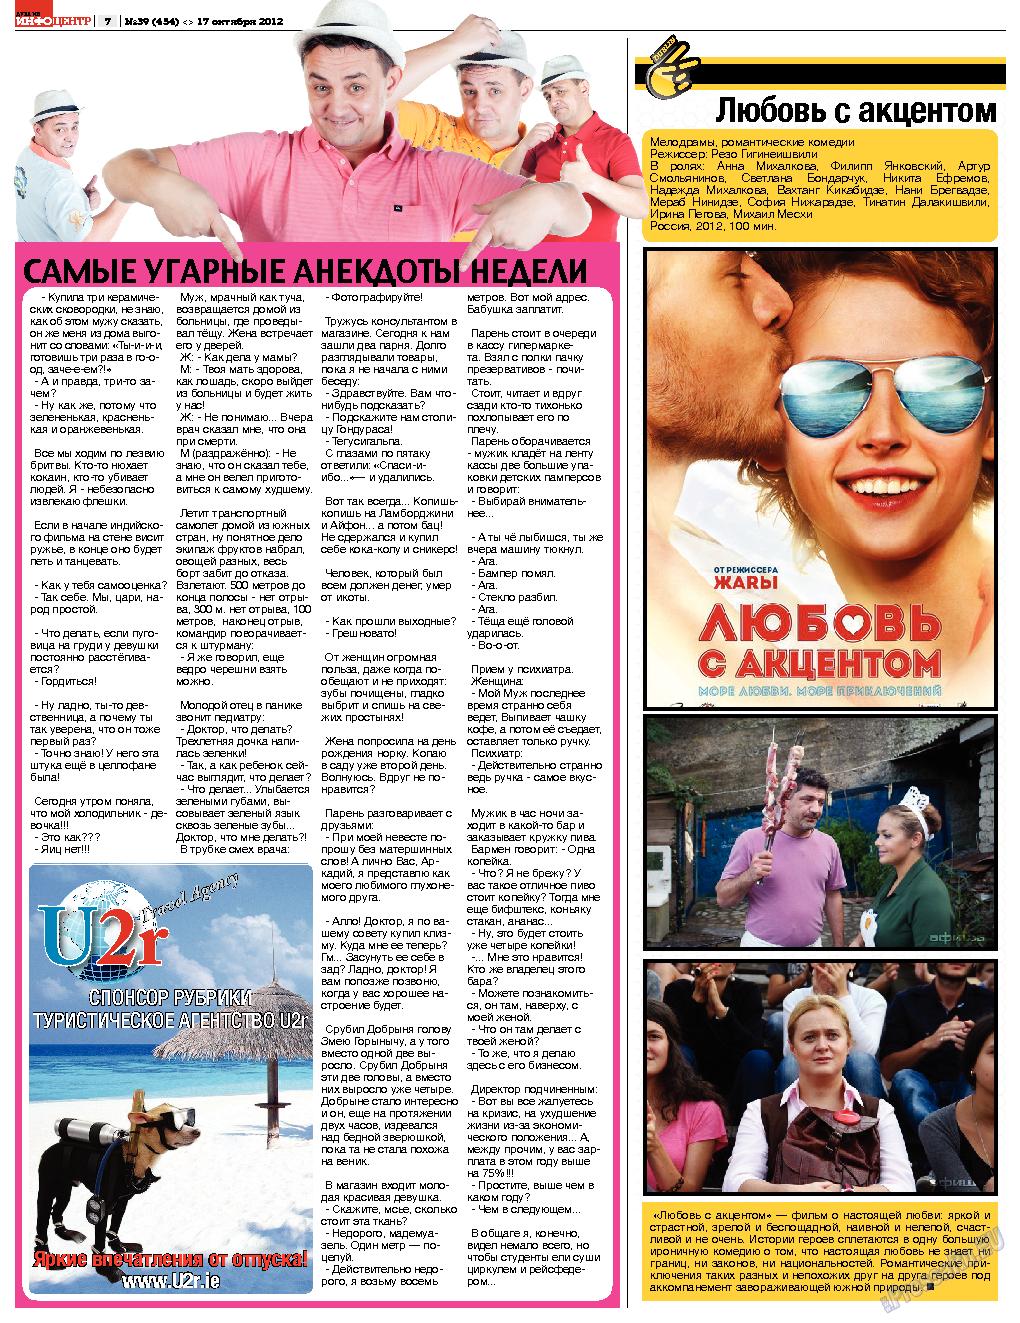 Дублин инфоцентр (газета). 2012 год, номер 38, стр. 7